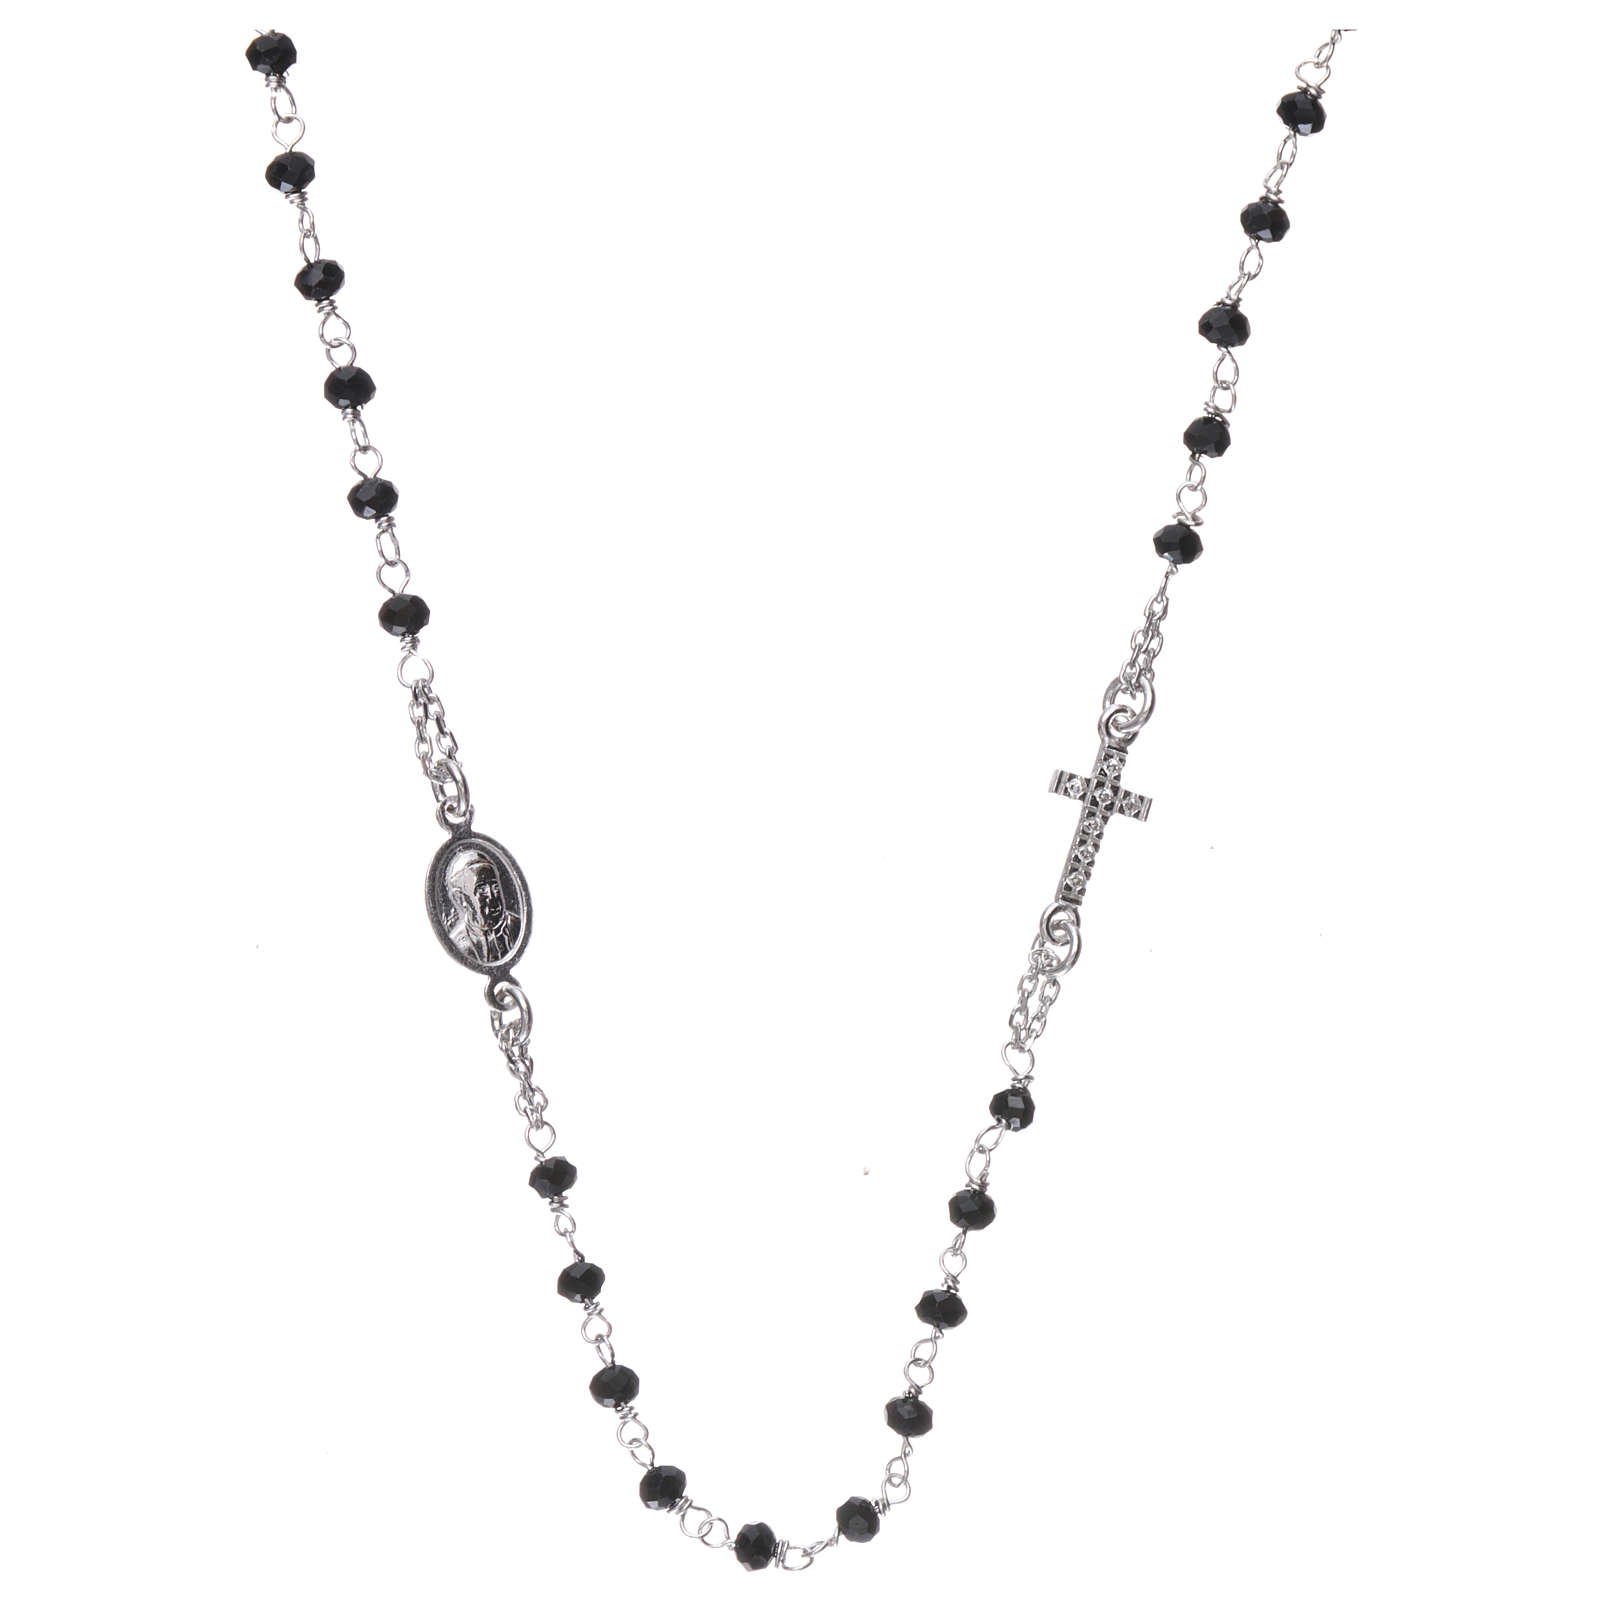 Rosary AMEN Necklace Pavè black crystals silver 925, Rhodium finish 4